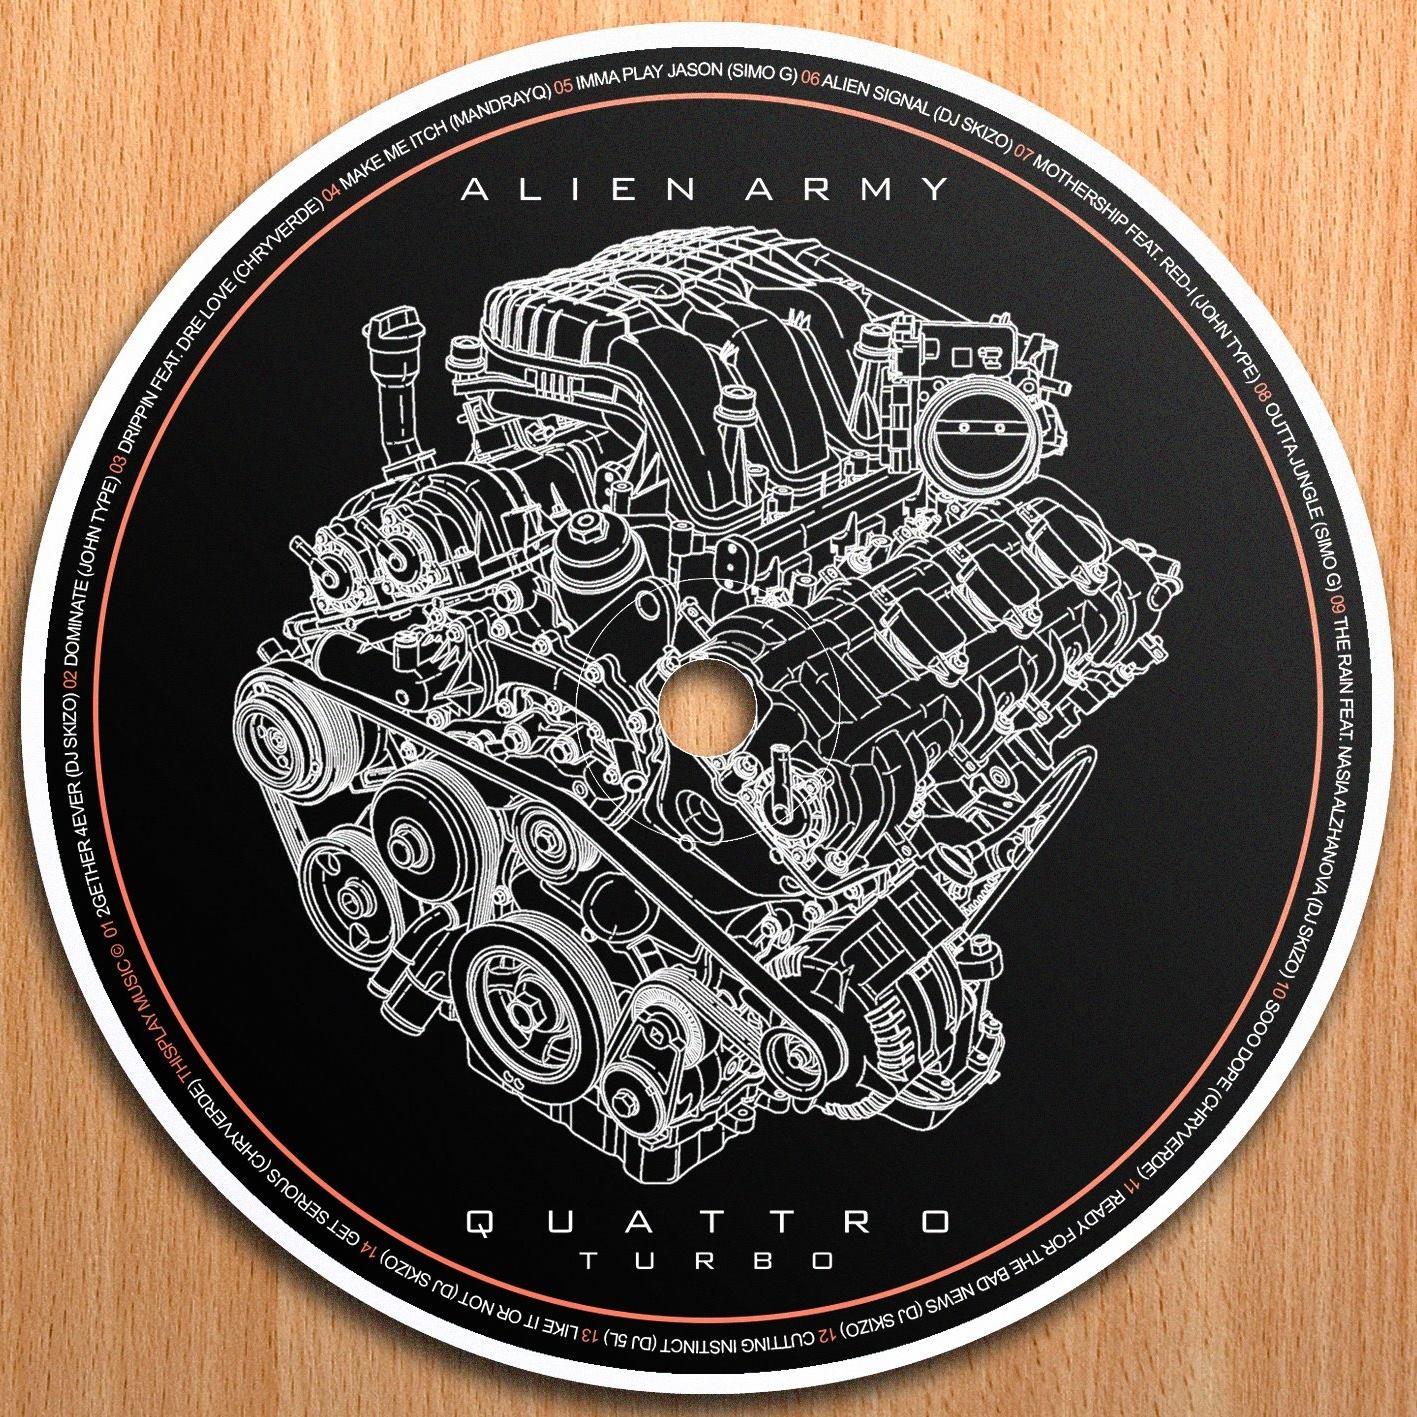 Alien Army - Quattro CD Preview